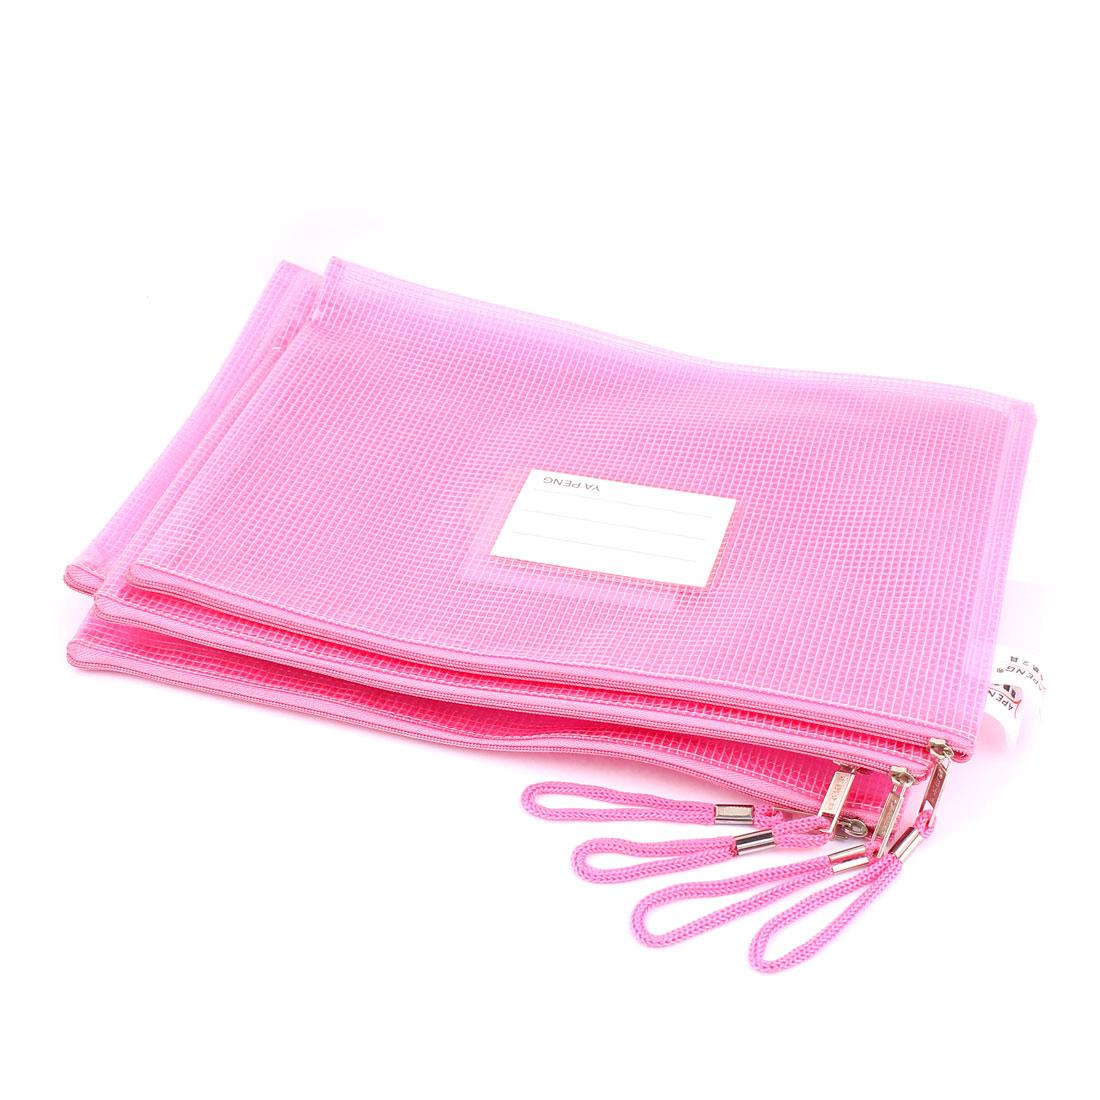 4 Pcs Office School Zipper Closure Plastic B5 File Testing Paper Storage Mesh Bag Pink